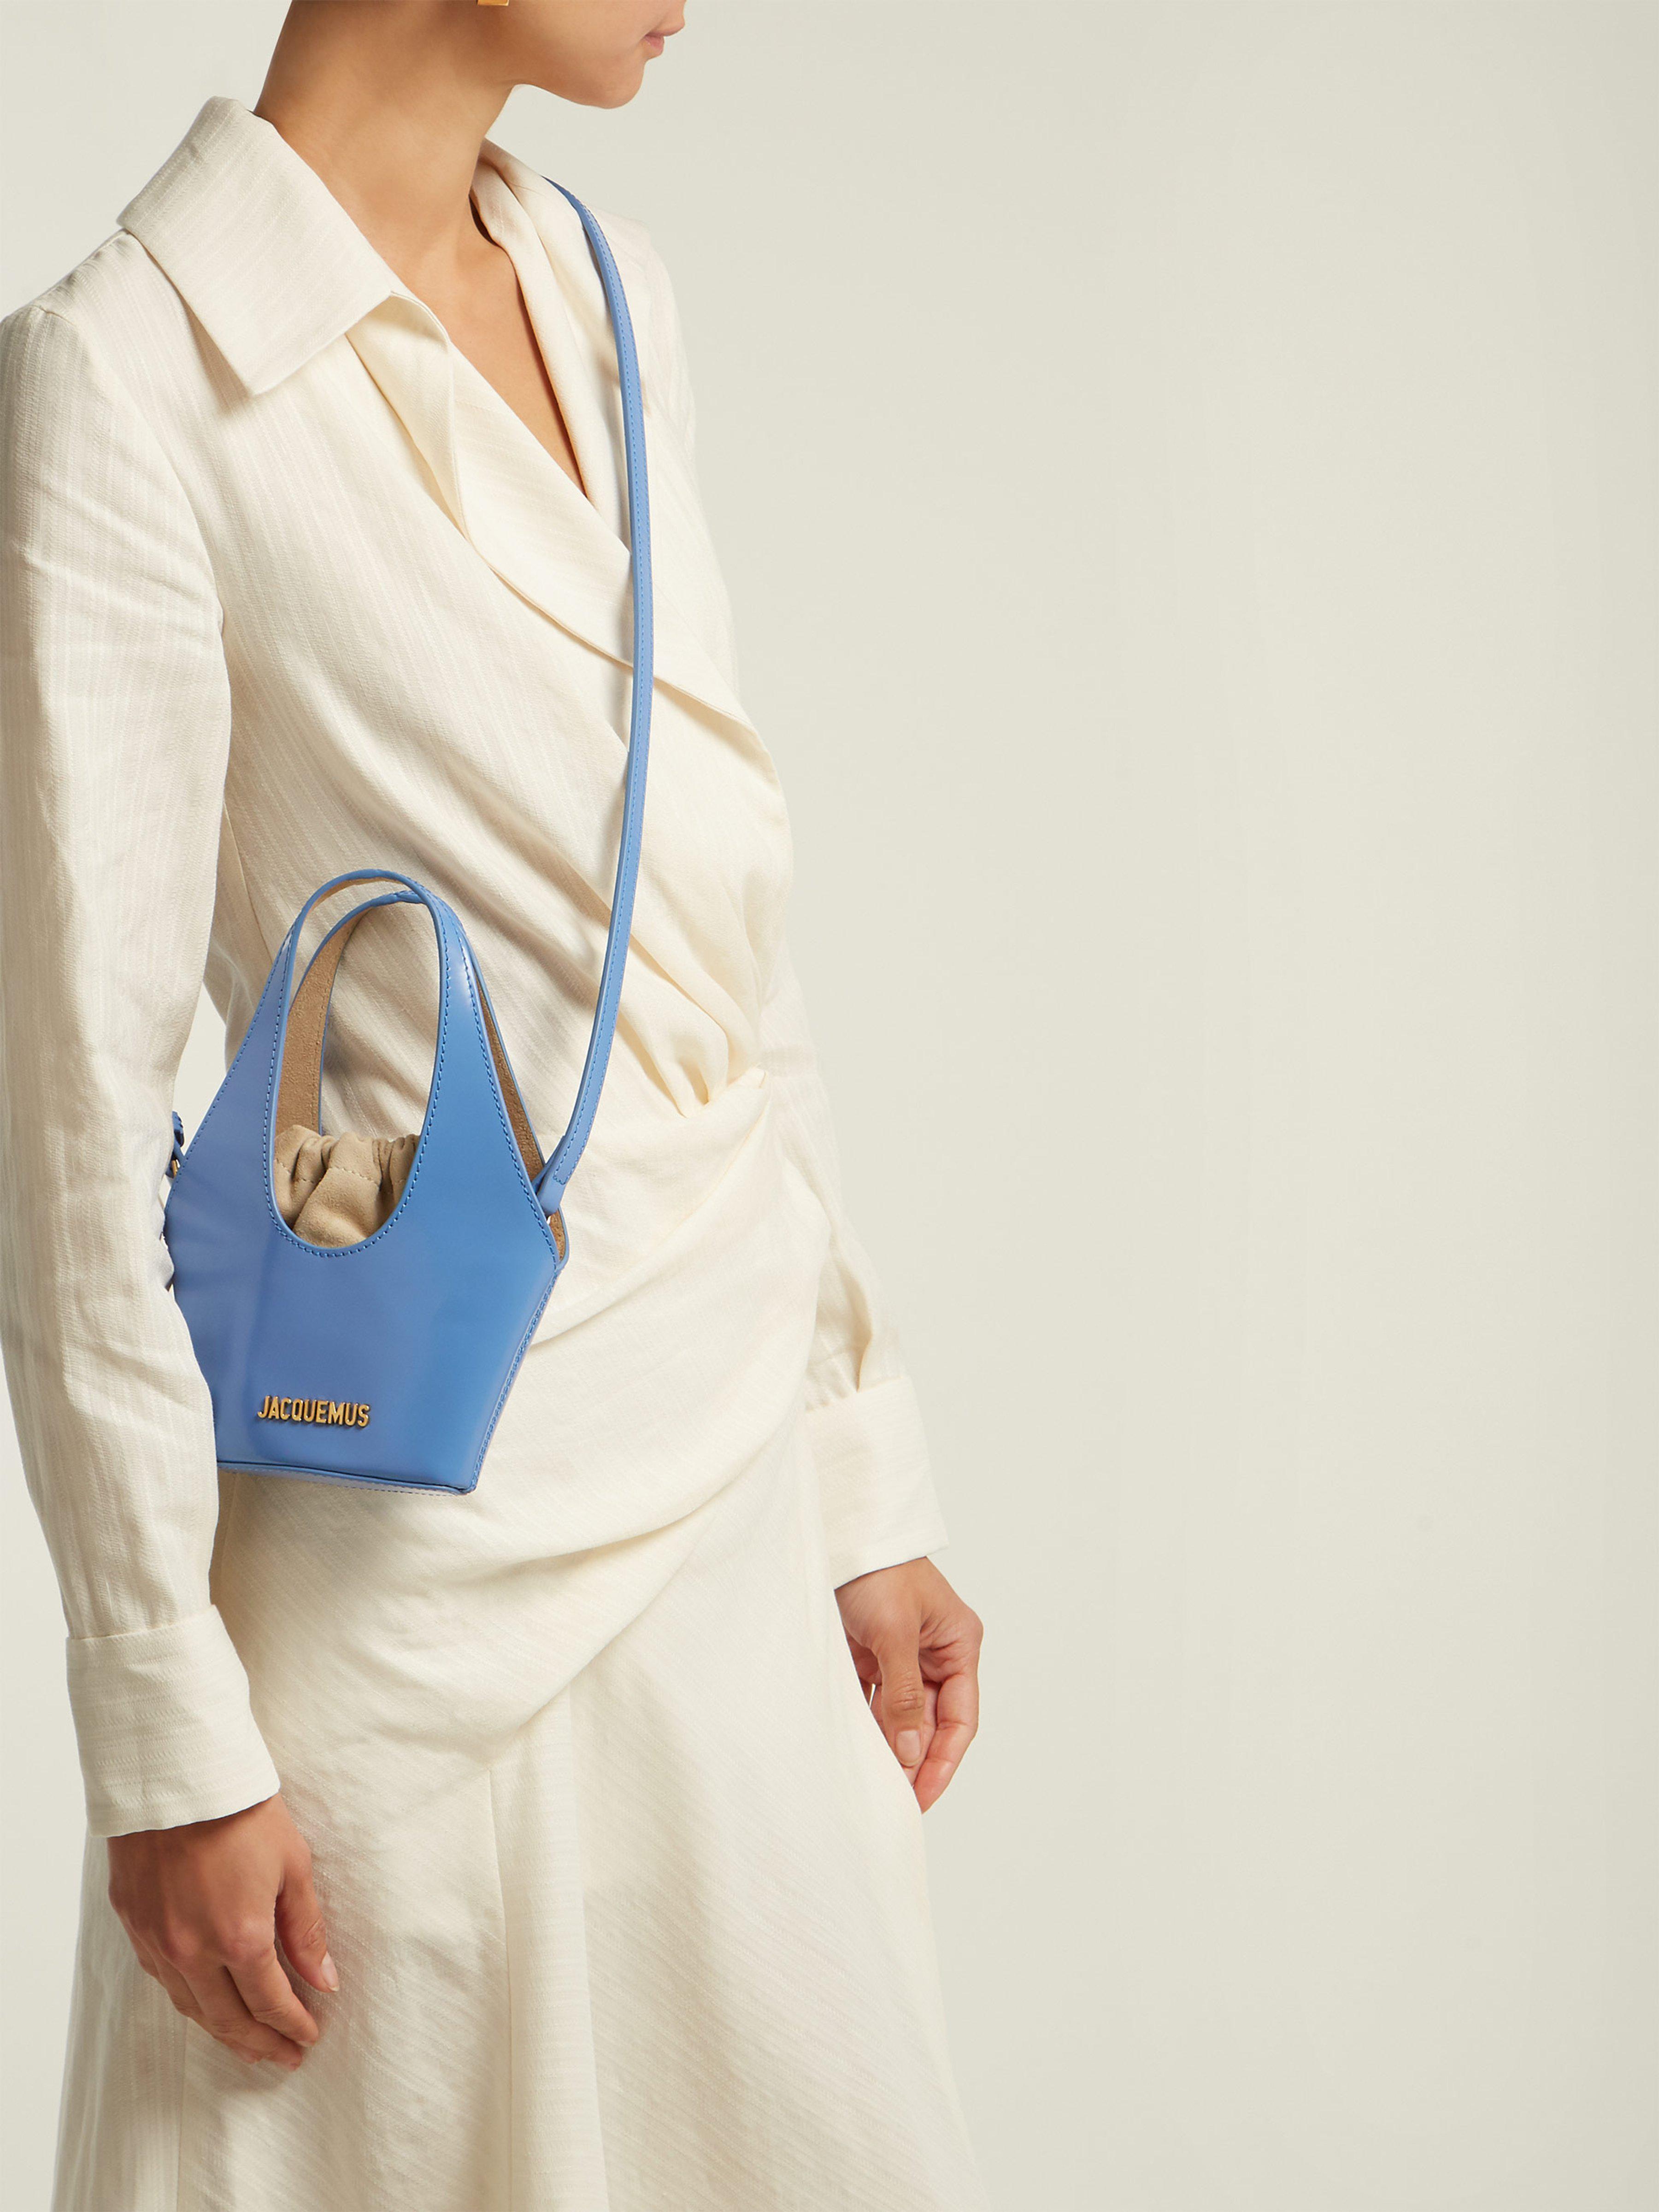 d8478e3fc618 Jacquemus Le Cariño Patent Leather Bag in Blue - Lyst